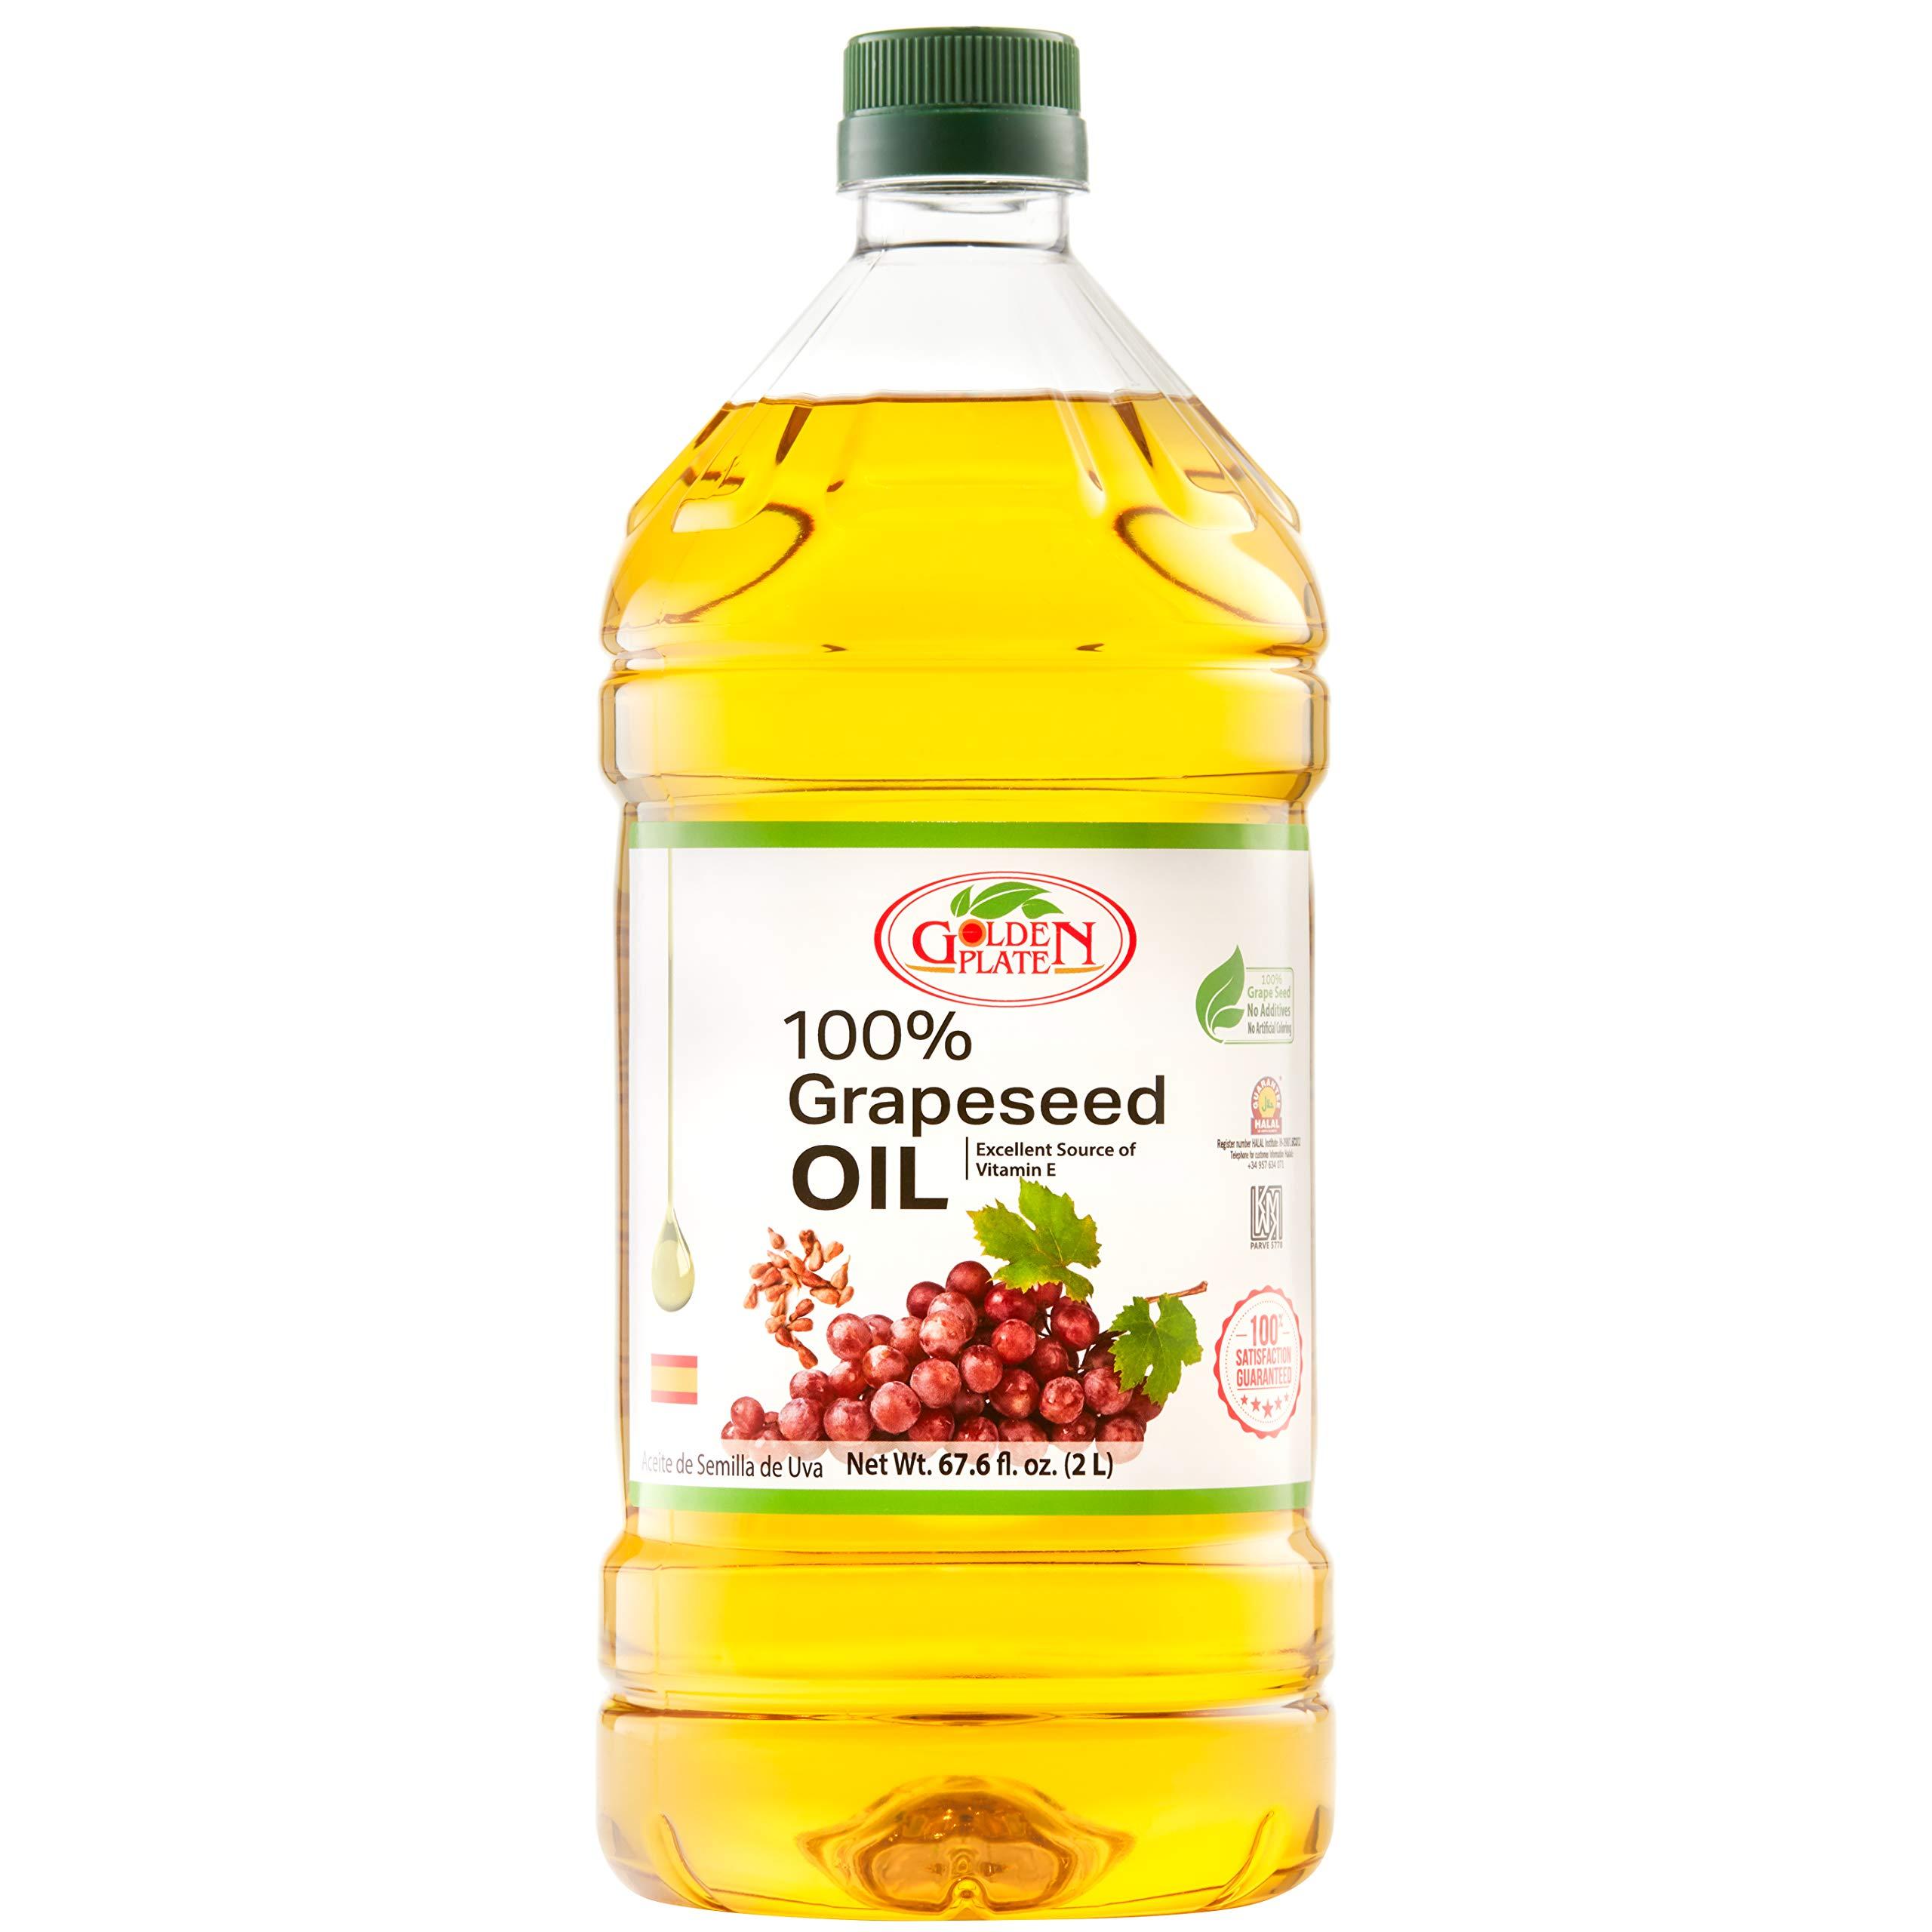 Golden Plate 100% Grapeseed Oil 67.6 fl oz 2 Liter 2000ml by GOLDEN PLATE